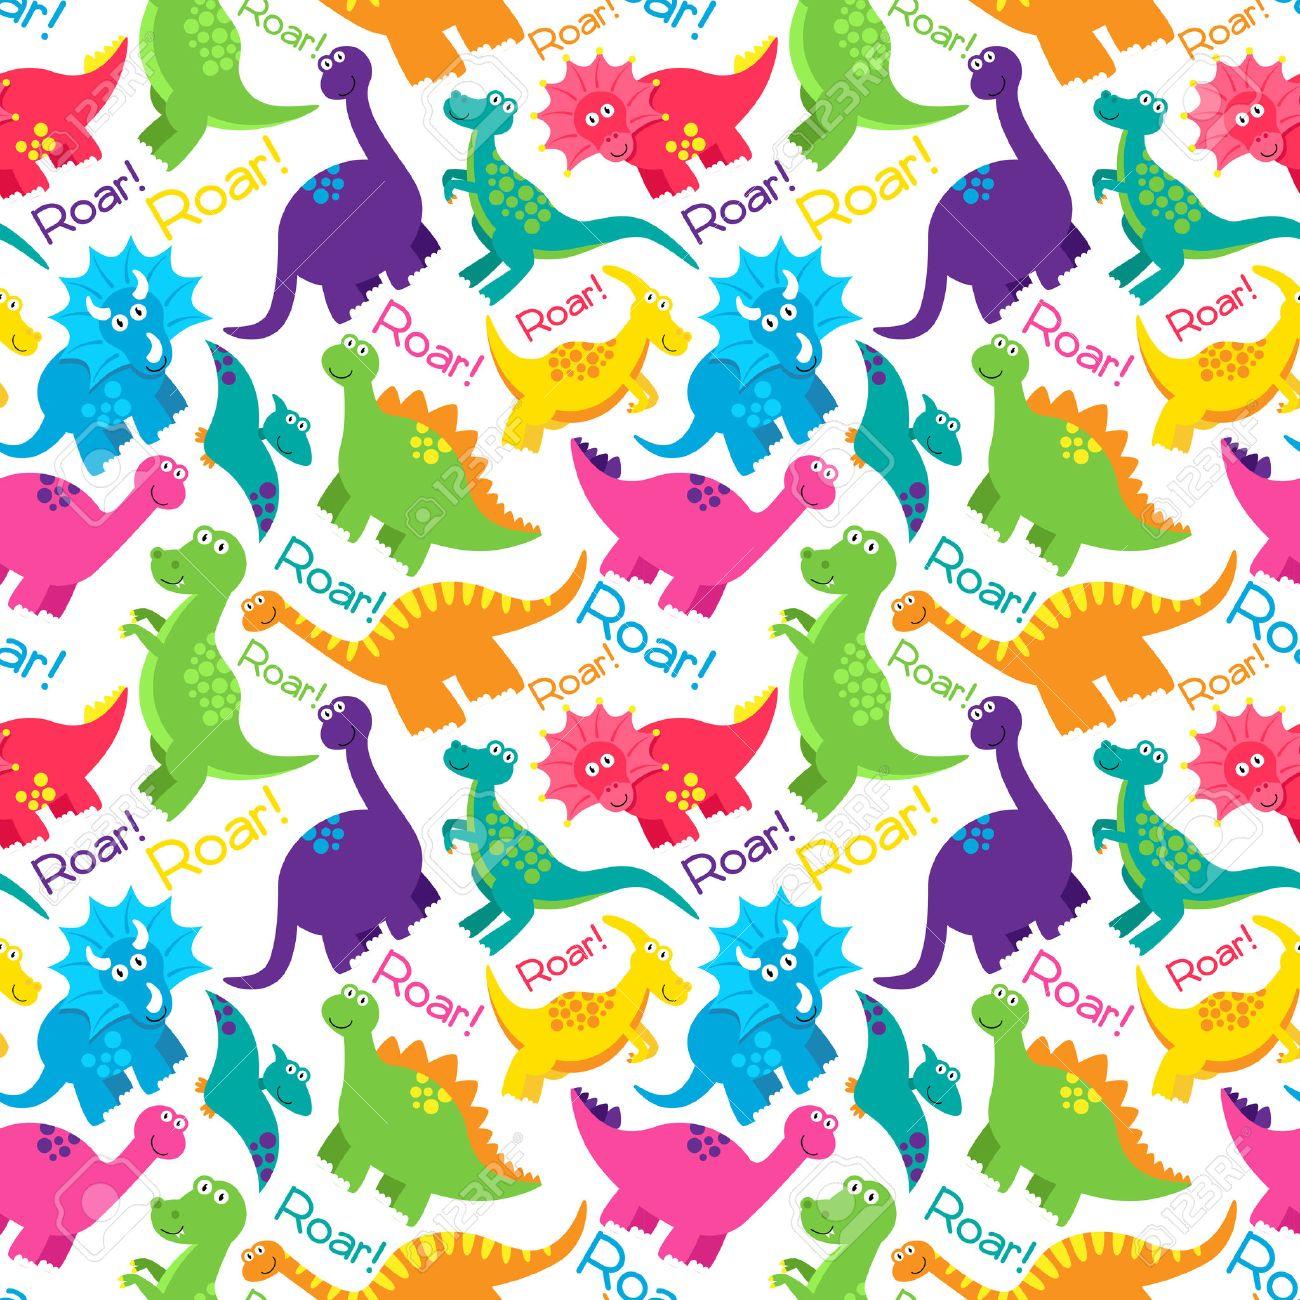 Dinosaur Seamless Tileable Vector Background Pattern - 37193145